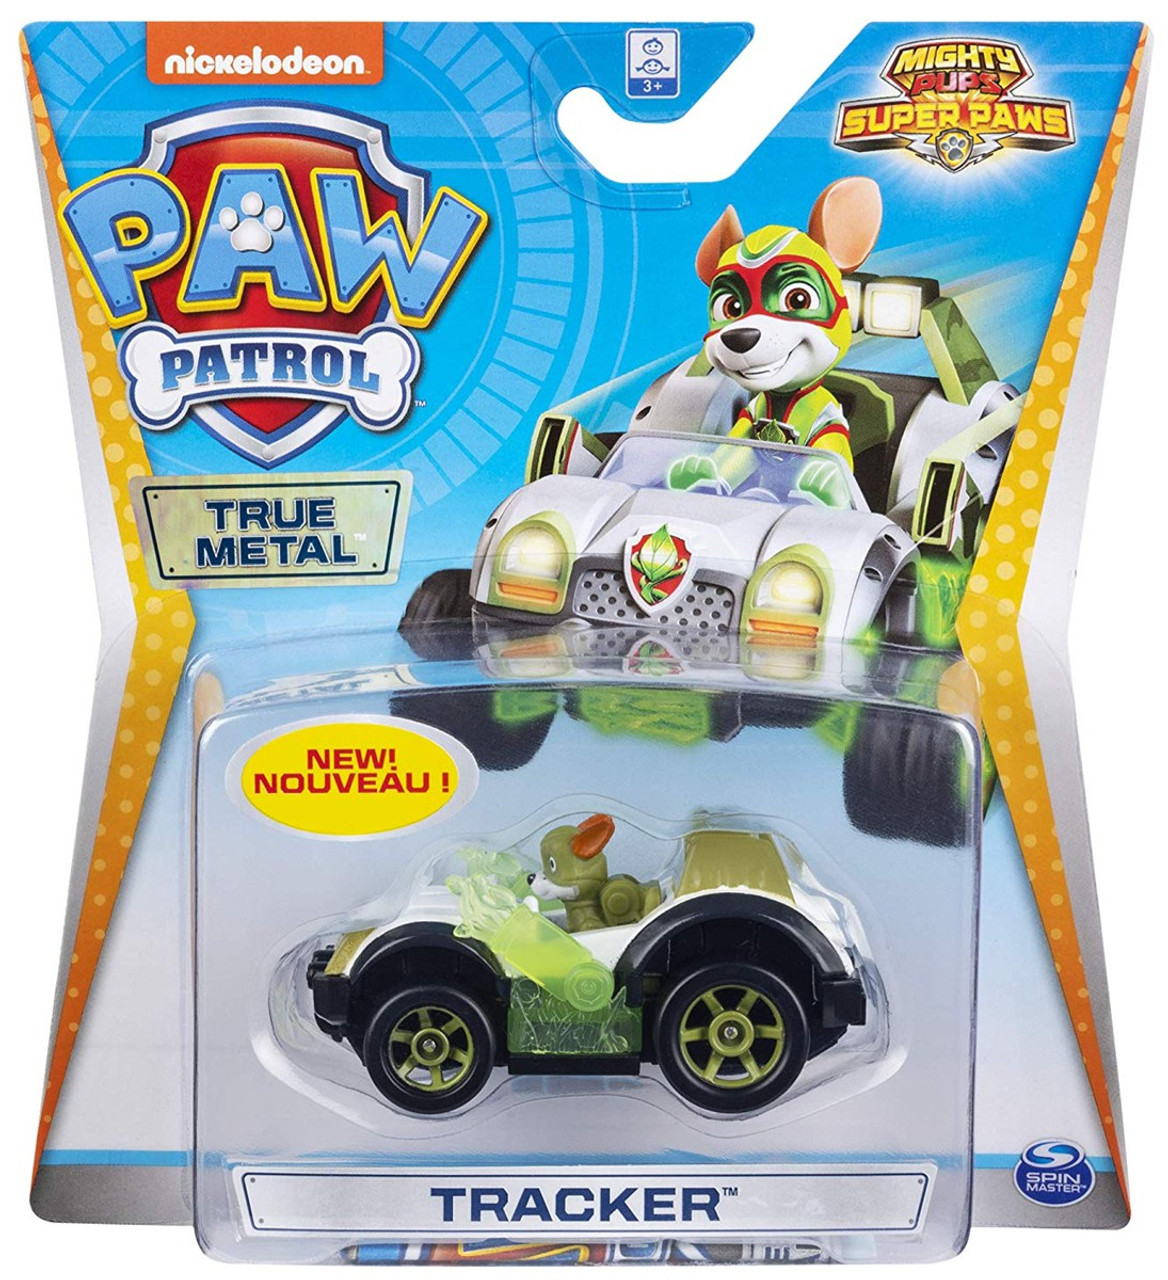 NEW Nickelodeon Paw Patrol Mighty Pups Super Paws Ryder Metal Mini Figure ATV